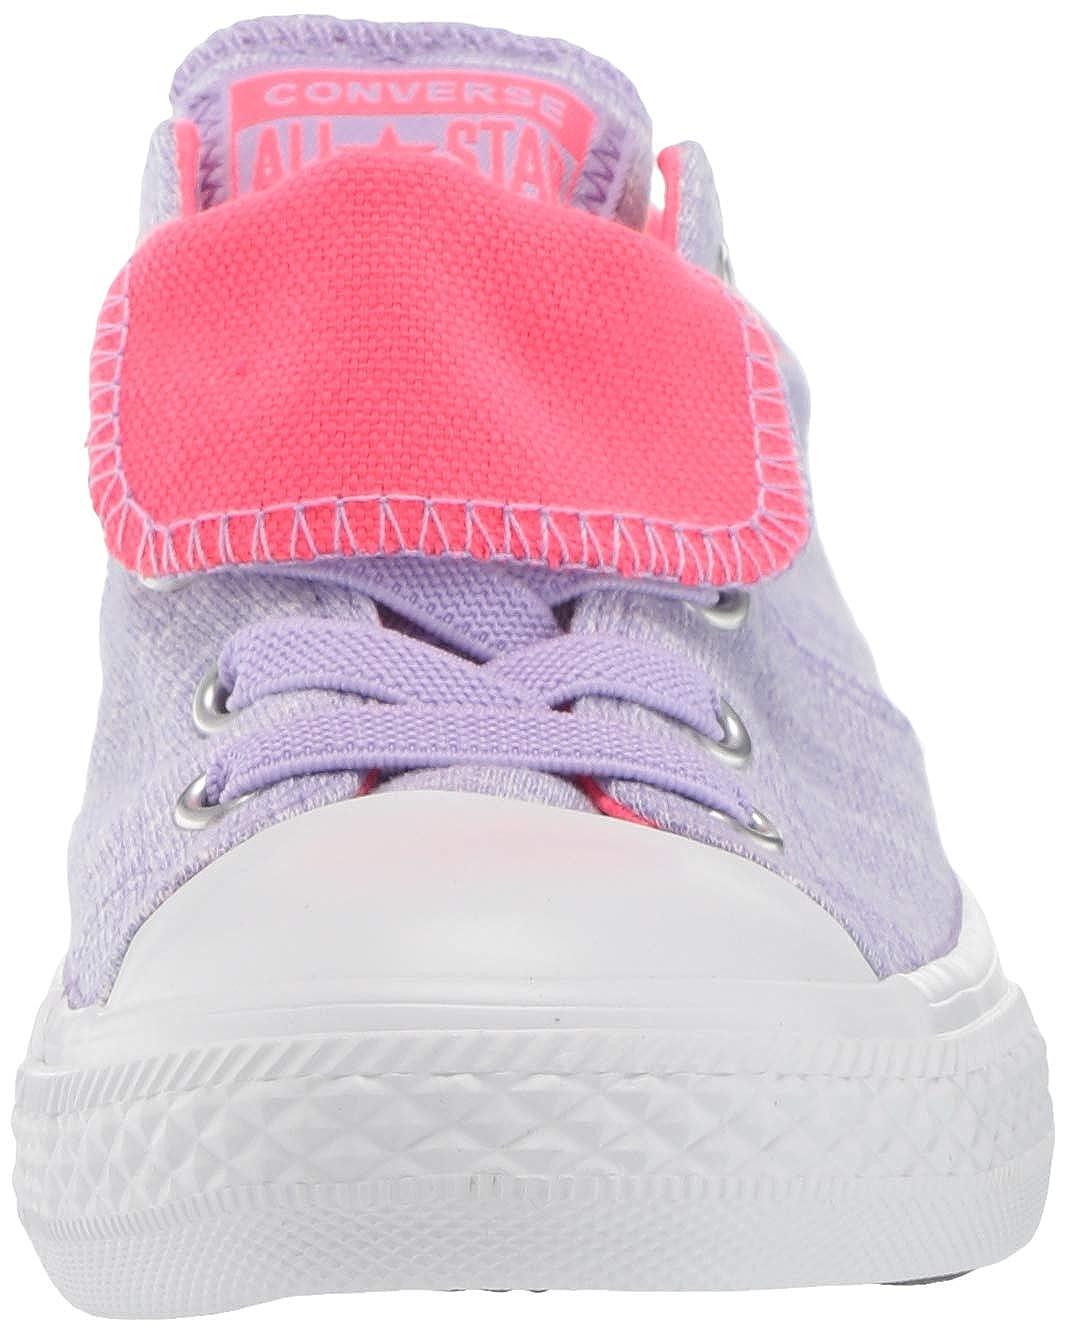 Converse Kids Chuck Taylor All Star Maddie Pop Canvas Slip on Sneaker